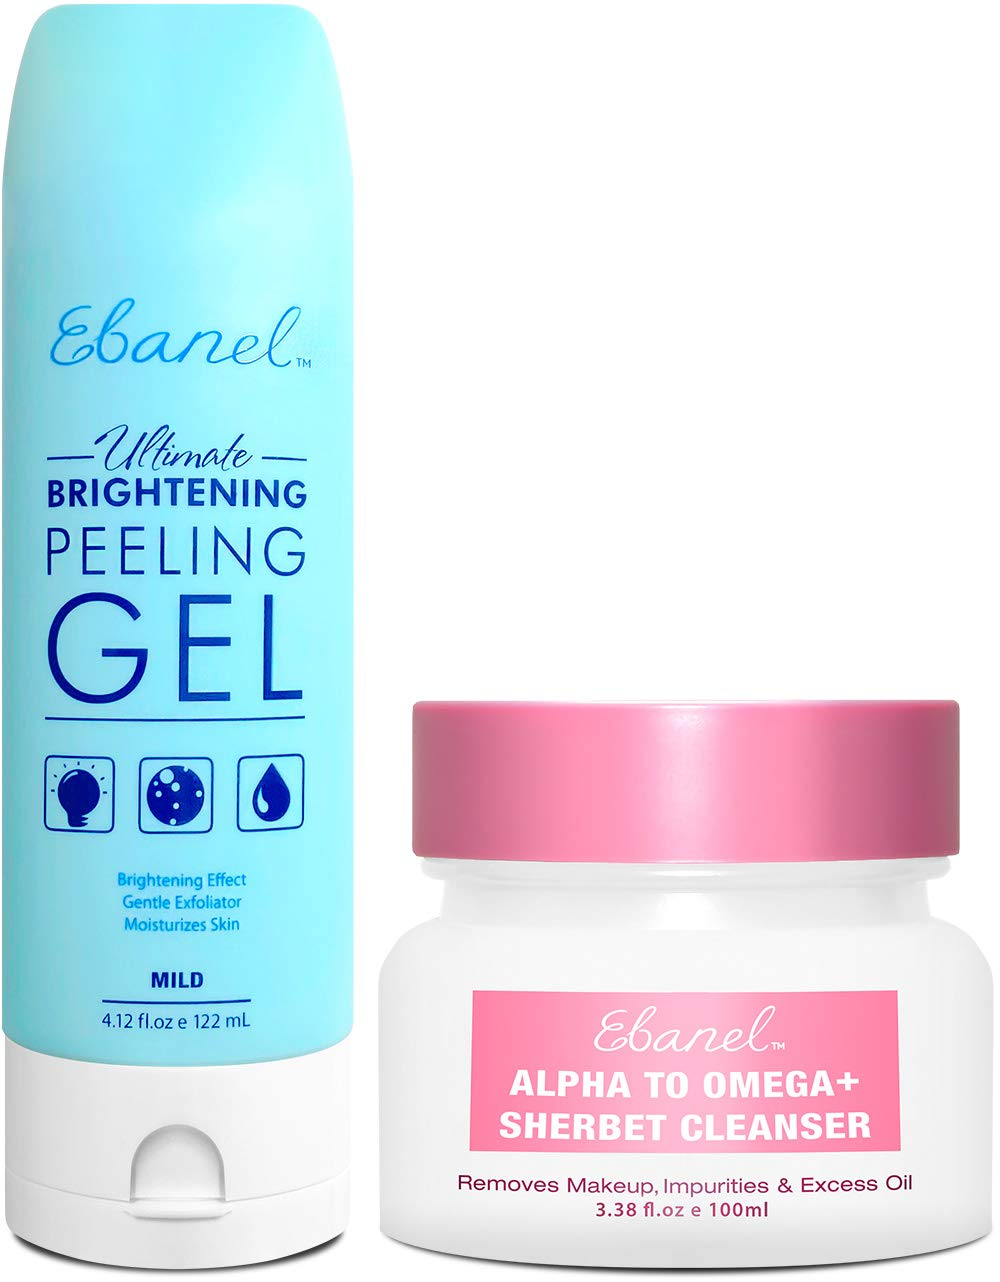 Ebanel Bundle of Gentle Exfoliating Face Scrub Peeling Gel 4.12 Oz, and Makeup Remover Cleansing Balm 3.38 Oz